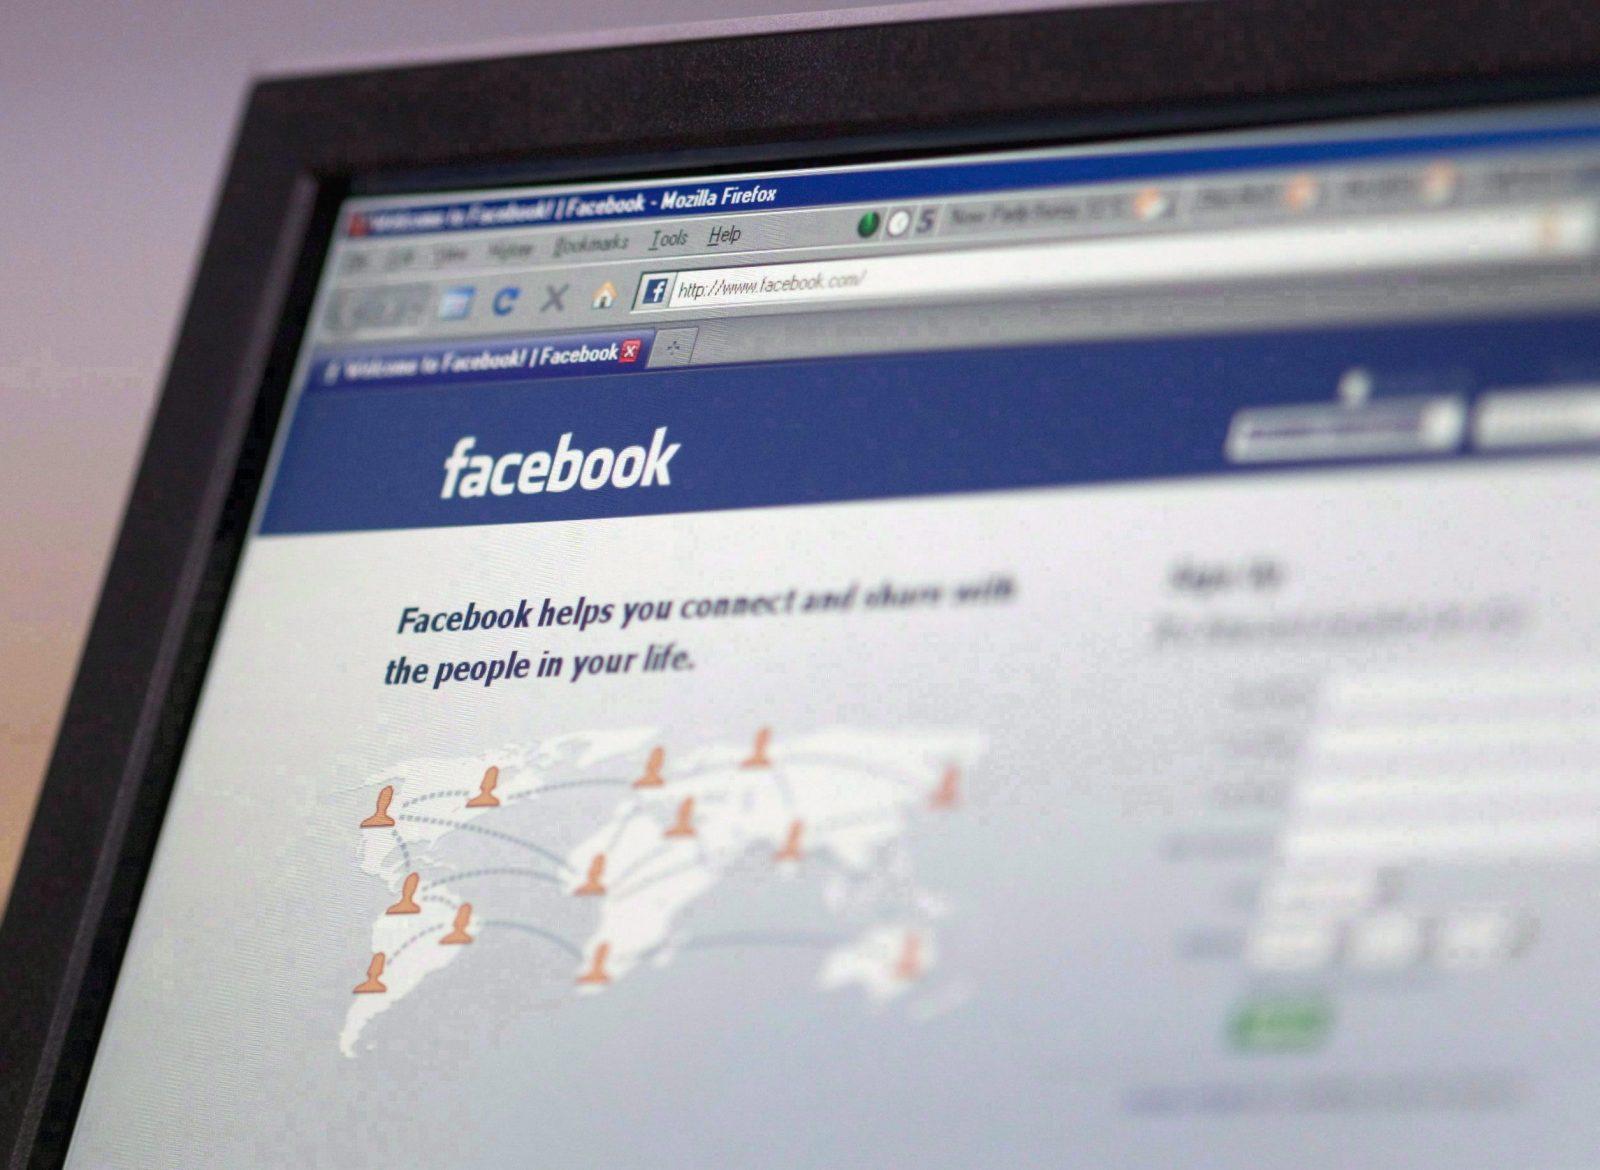 Schuldirektor wegen Facebook-Eintrag entlassen